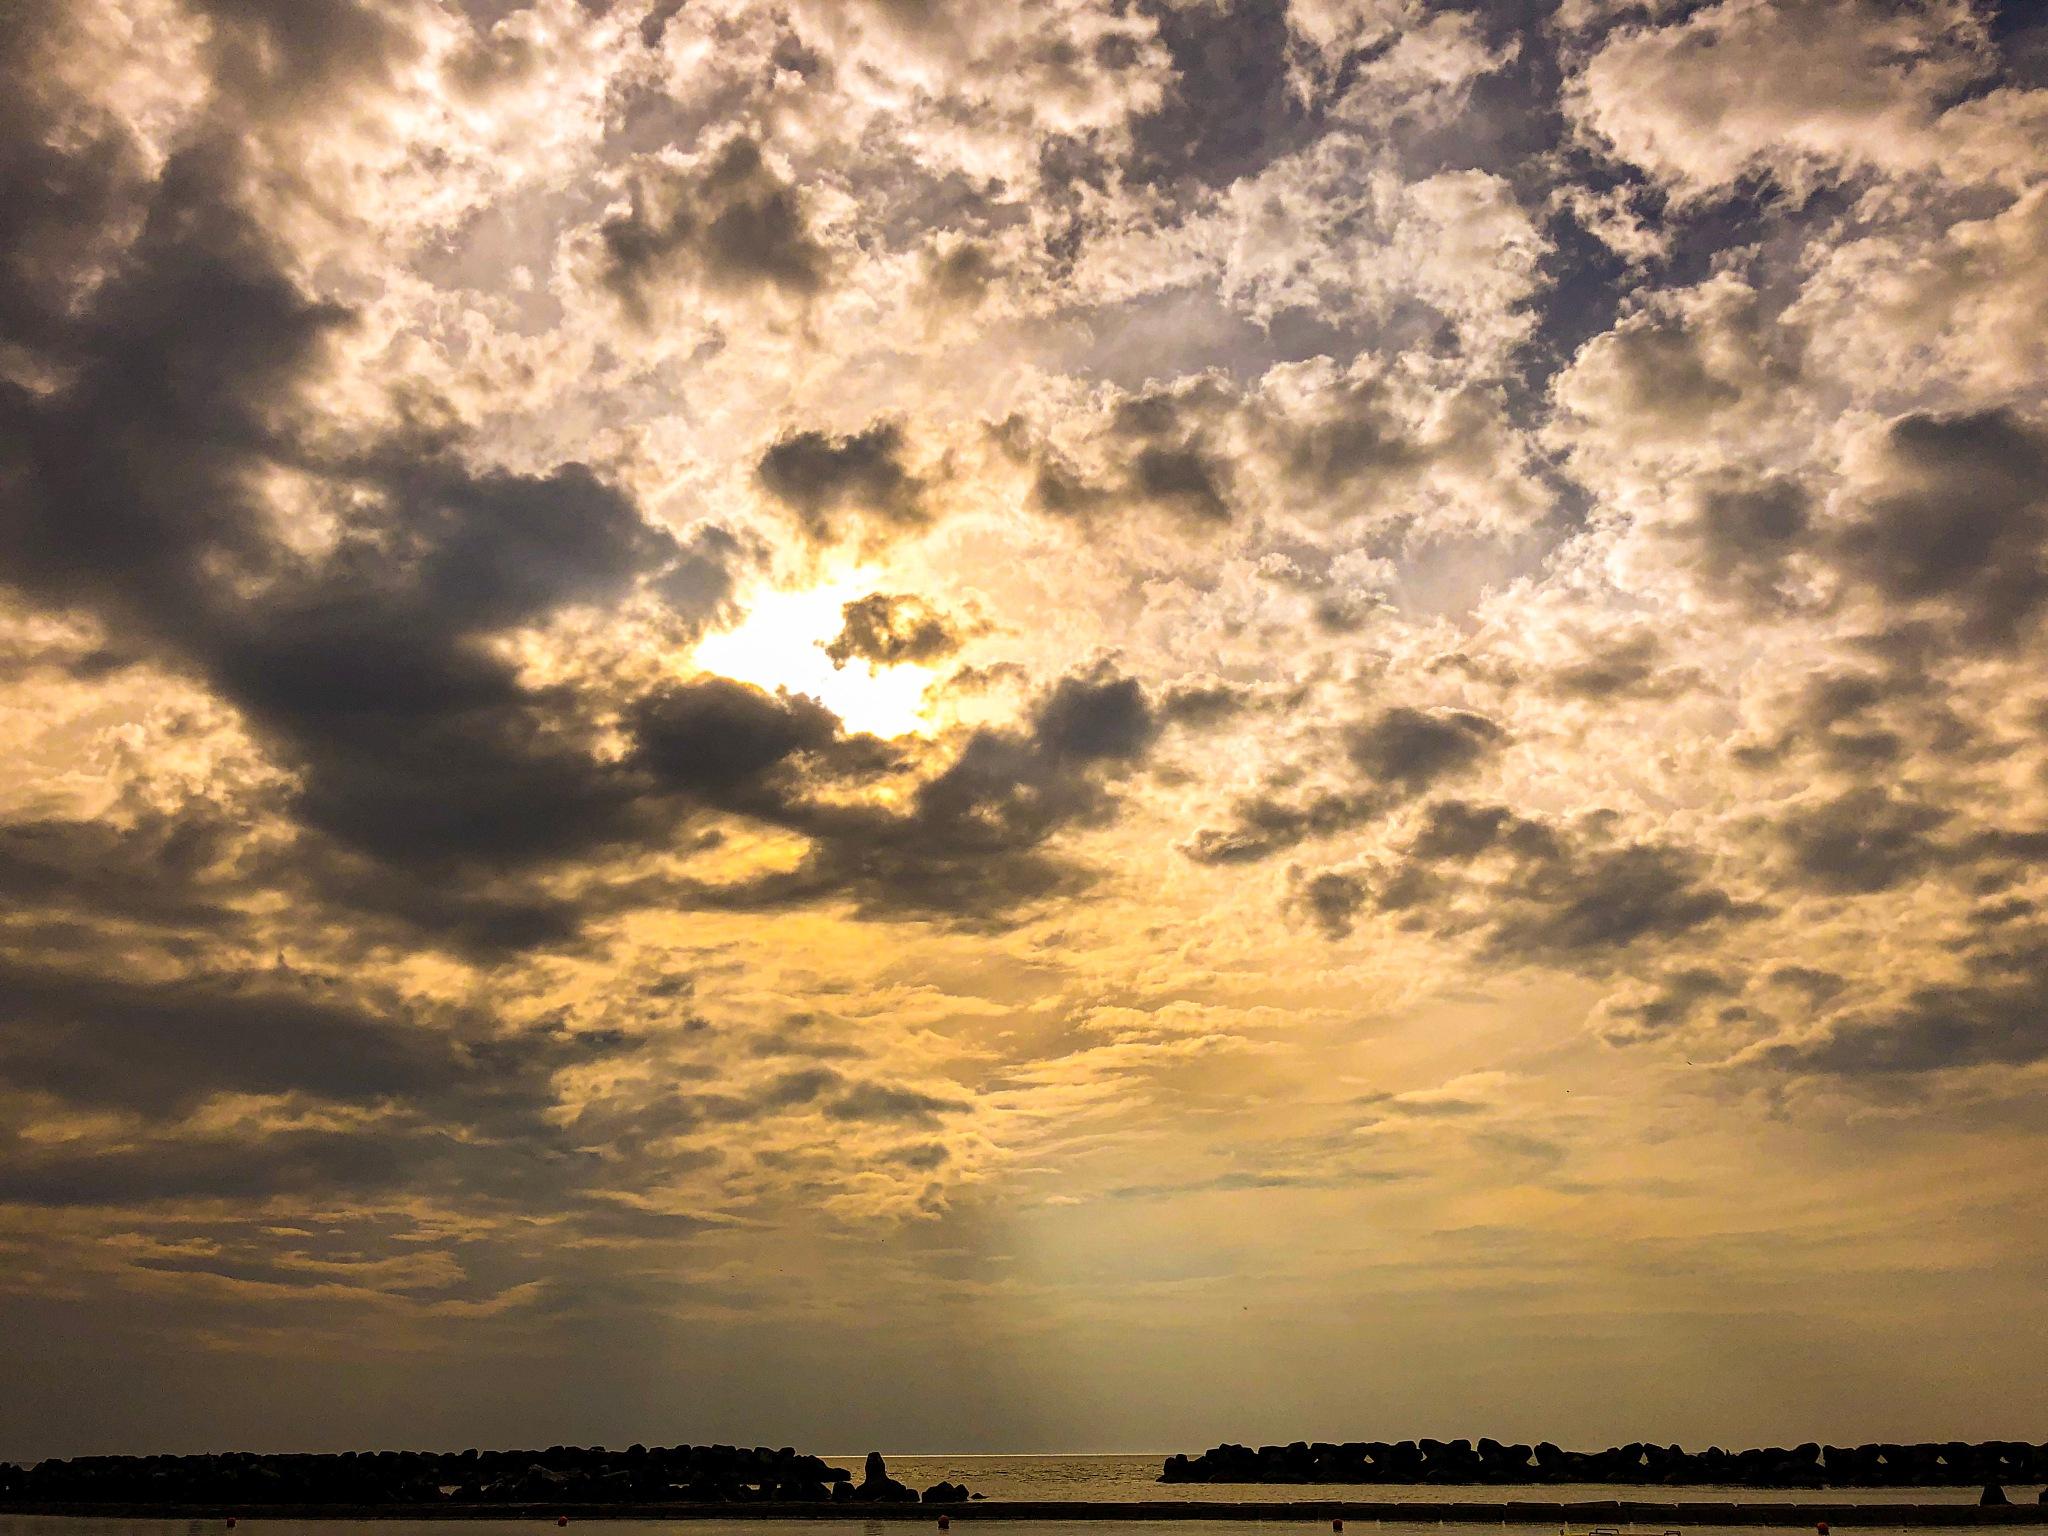 Sky by Joh